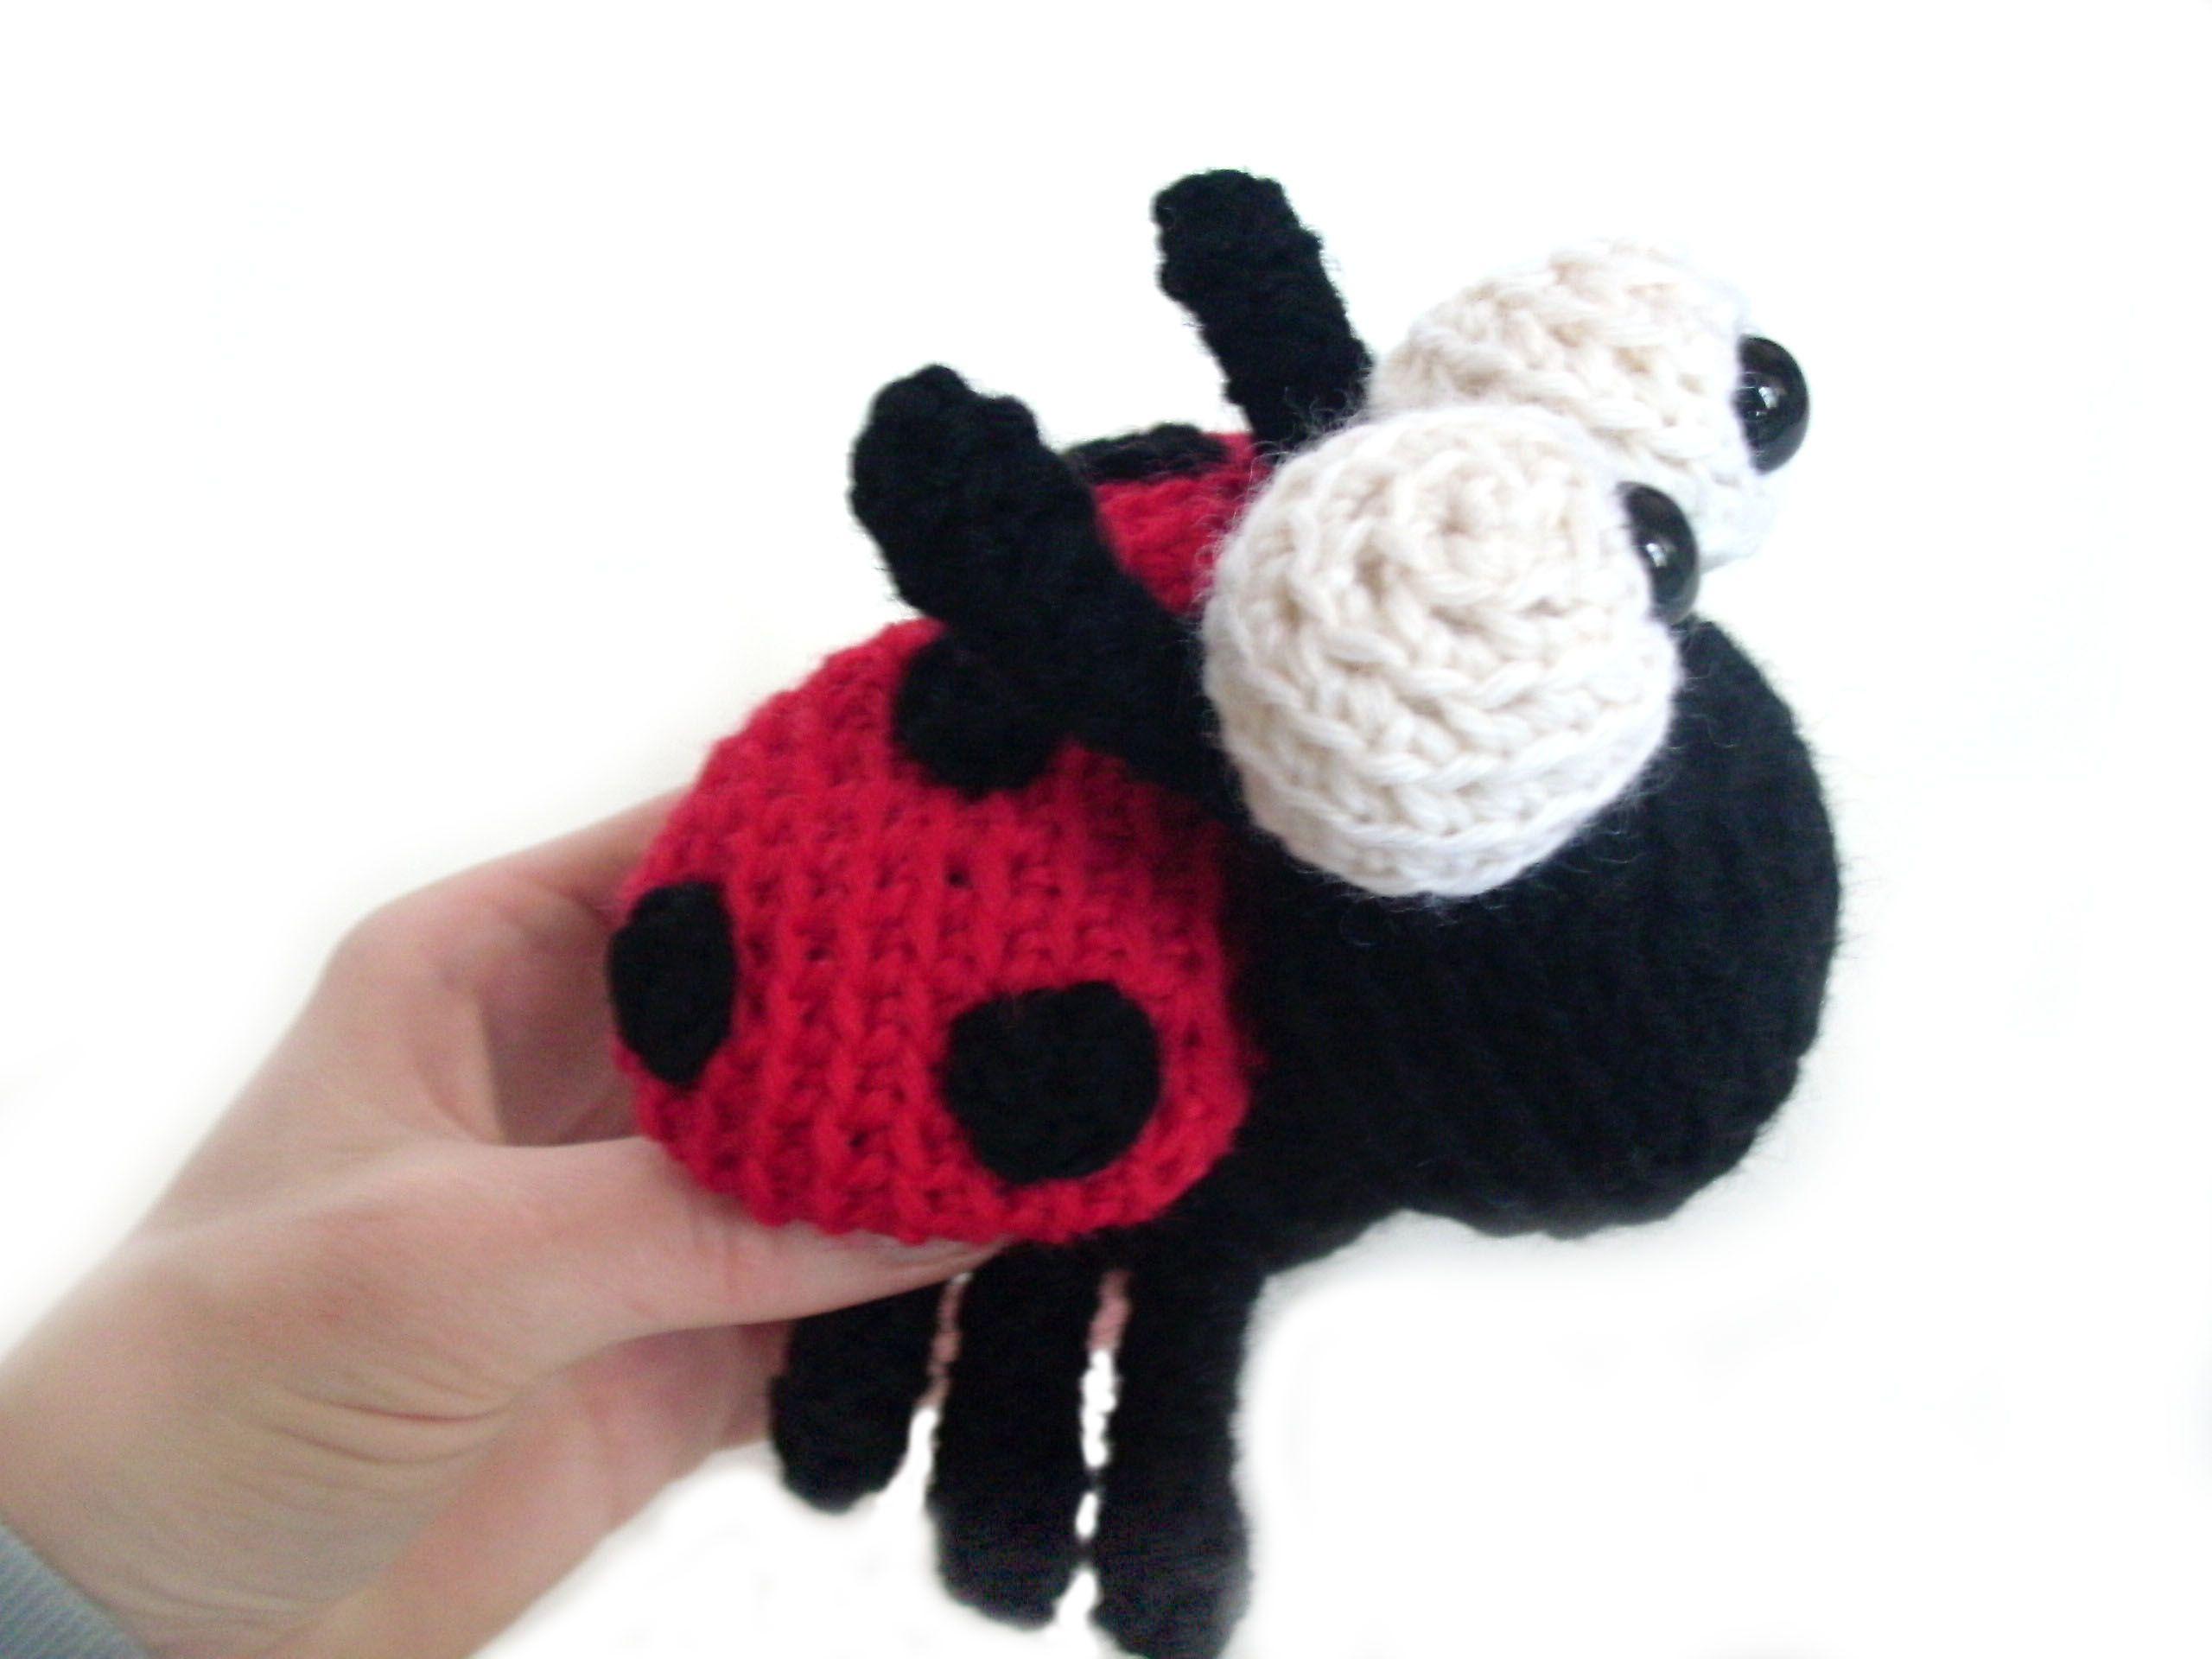 Ladybug afghan free pattern ladybug crochet pattern amigurumi ladybug afghan free pattern ladybug crochet pattern amigurumi crochet ladybug pattern bankloansurffo Choice Image